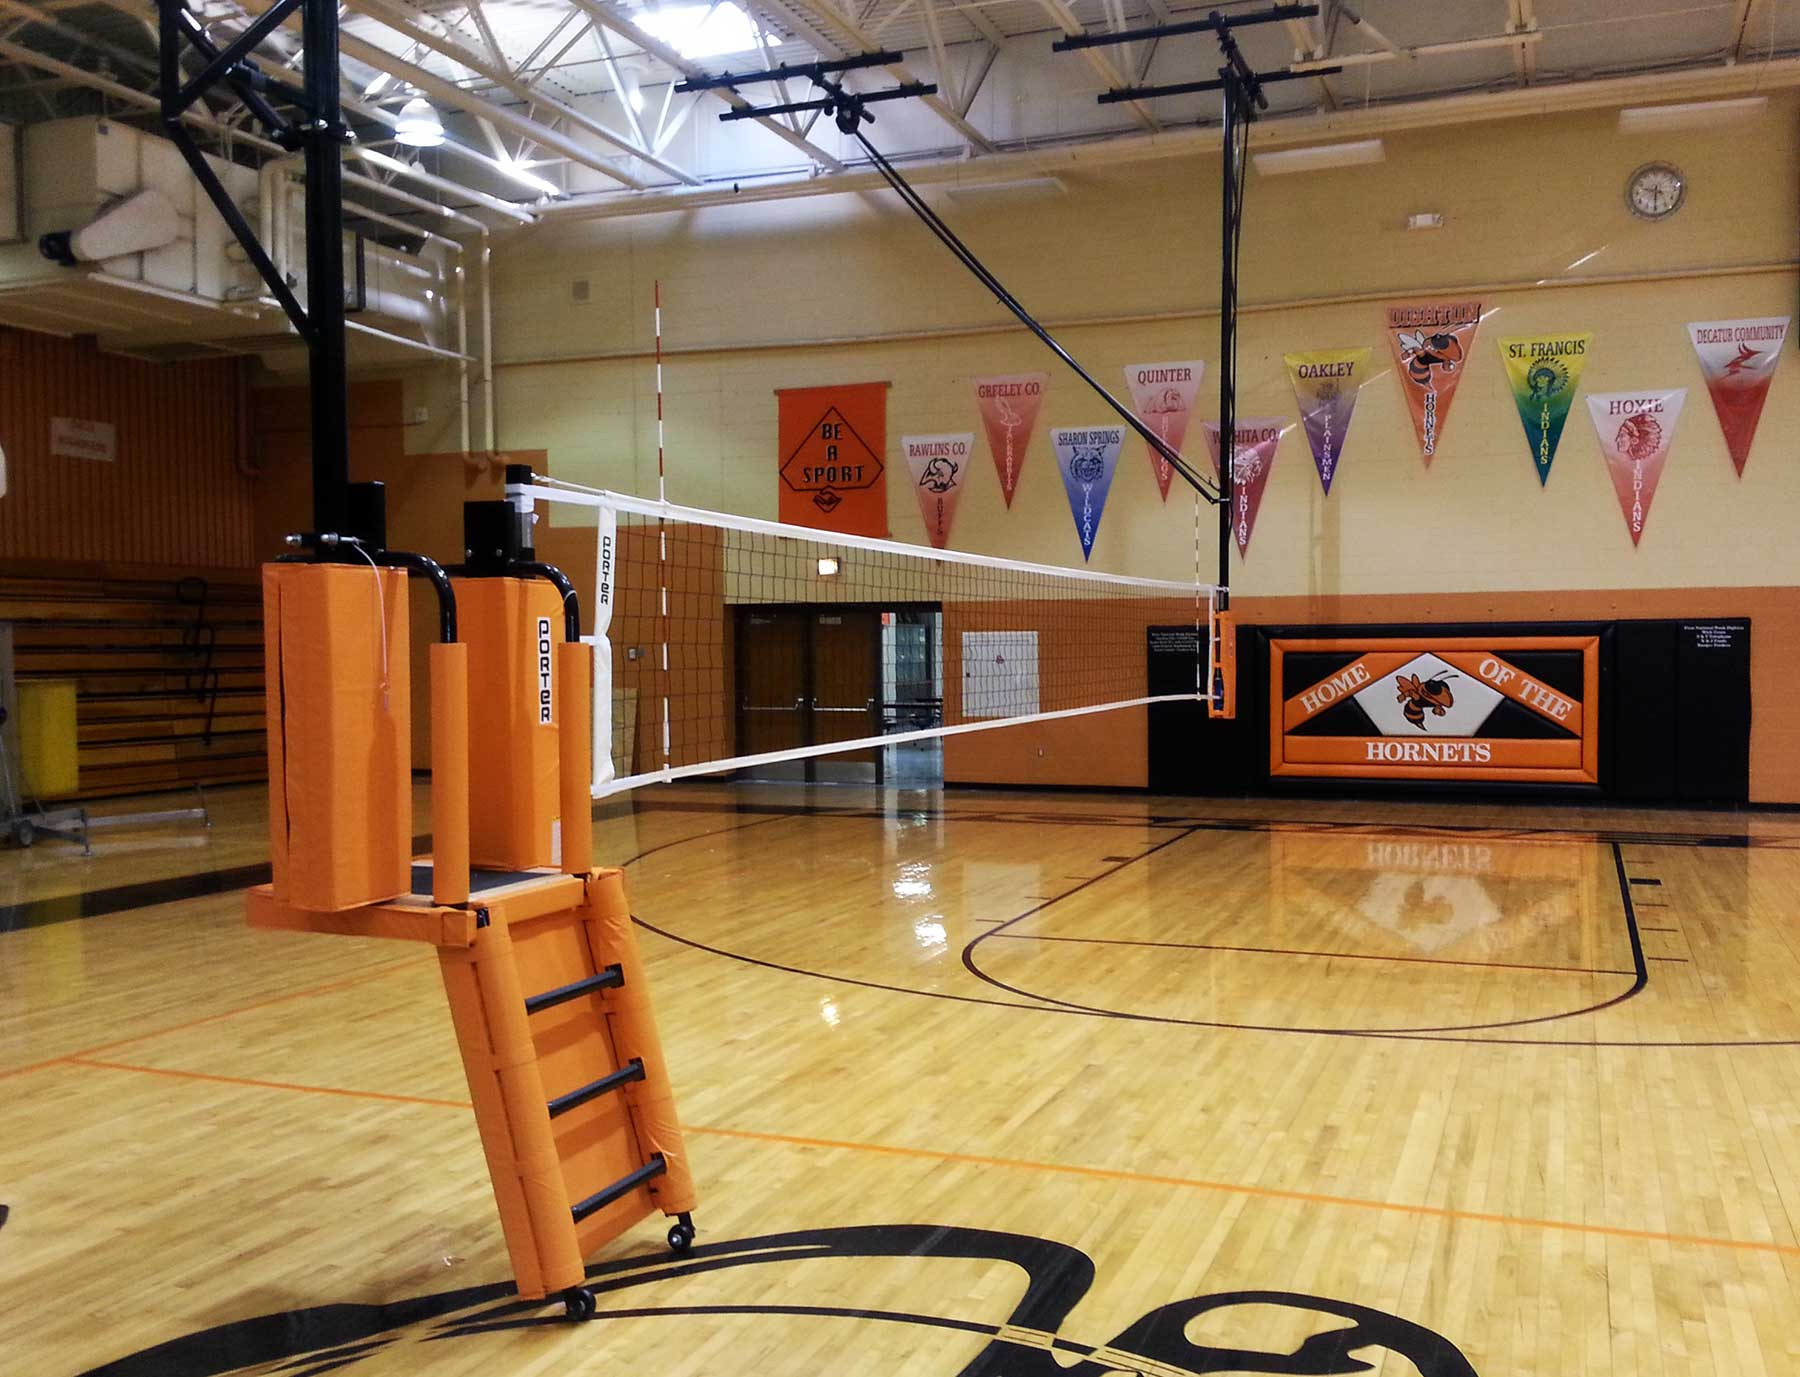 overhead-volleybal-gym-equipment